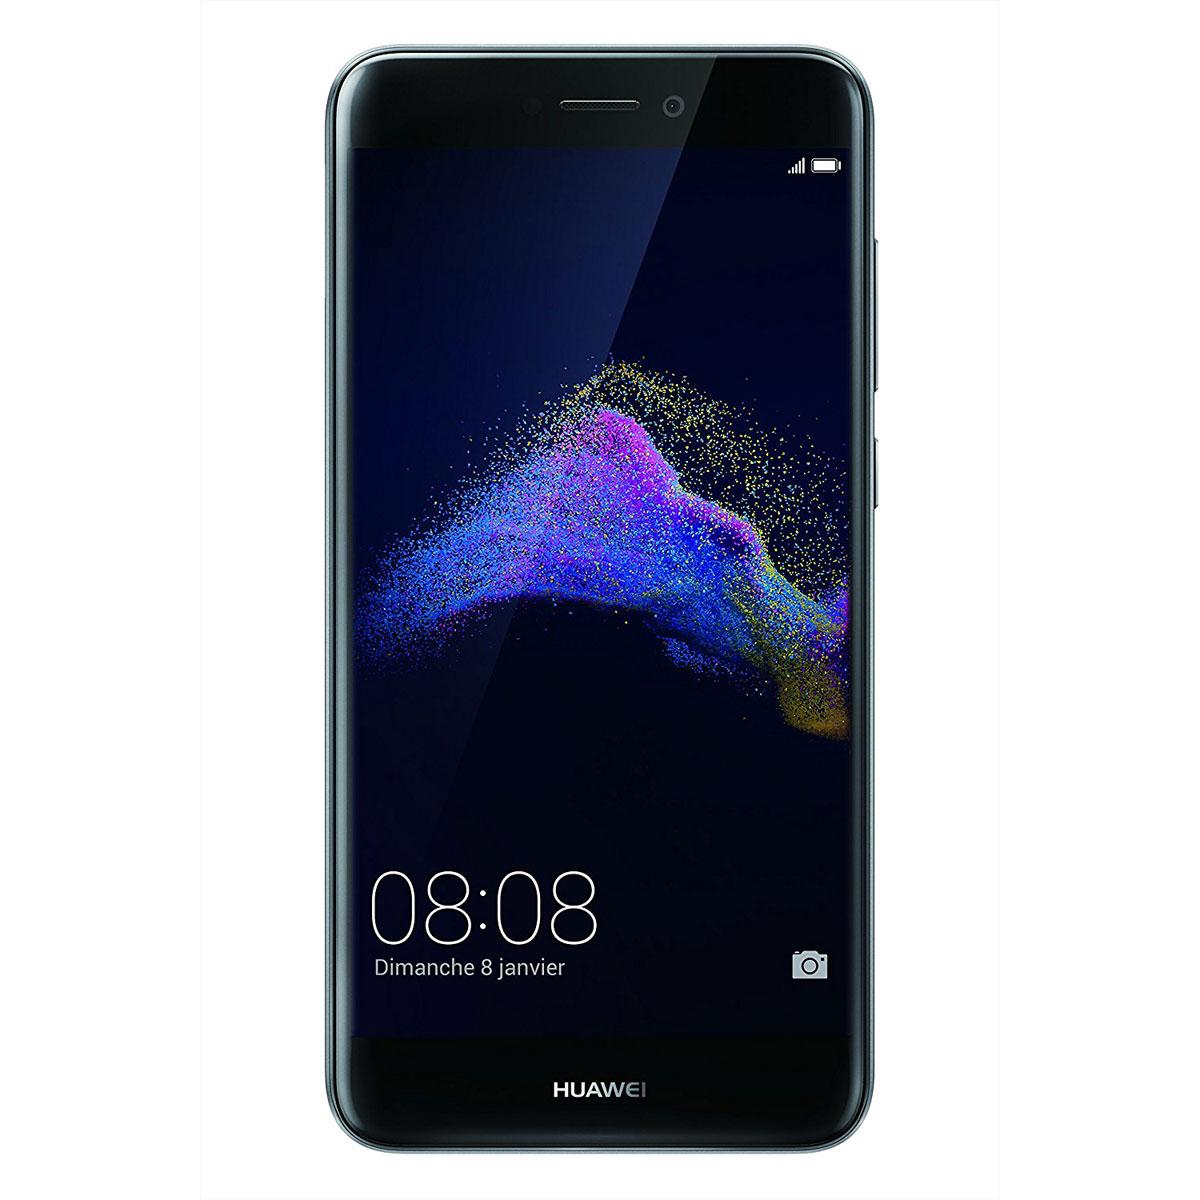 Huawei p8 lite 2017 noir 51091cdm achat vente mobile for Photo ecran huawei